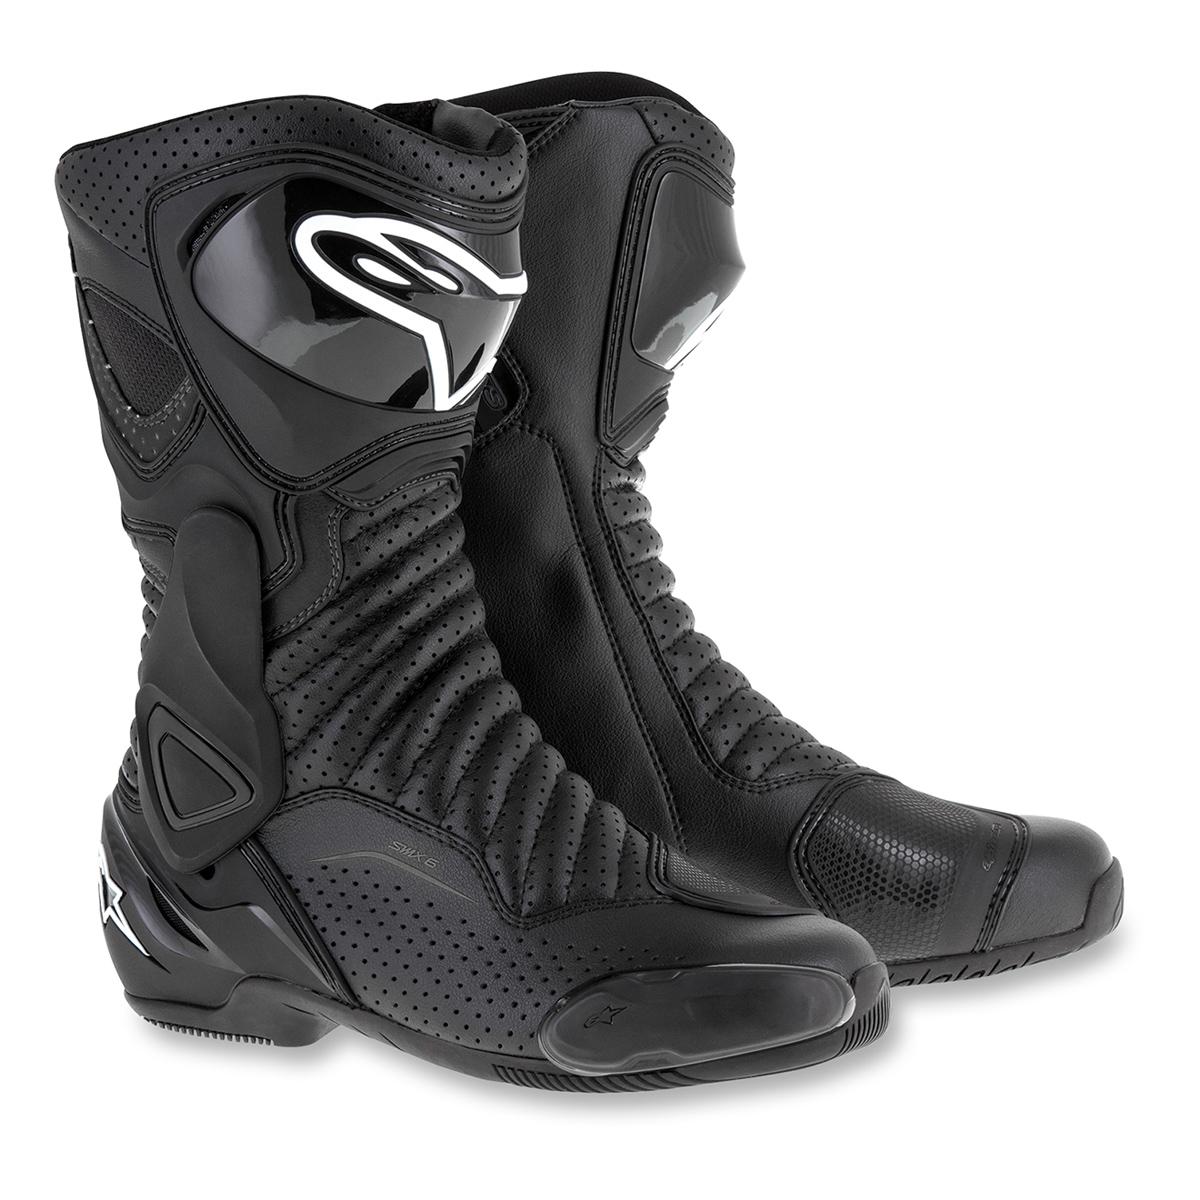 Alpinestars Men's SMX-6 v2 Vented Black Boots